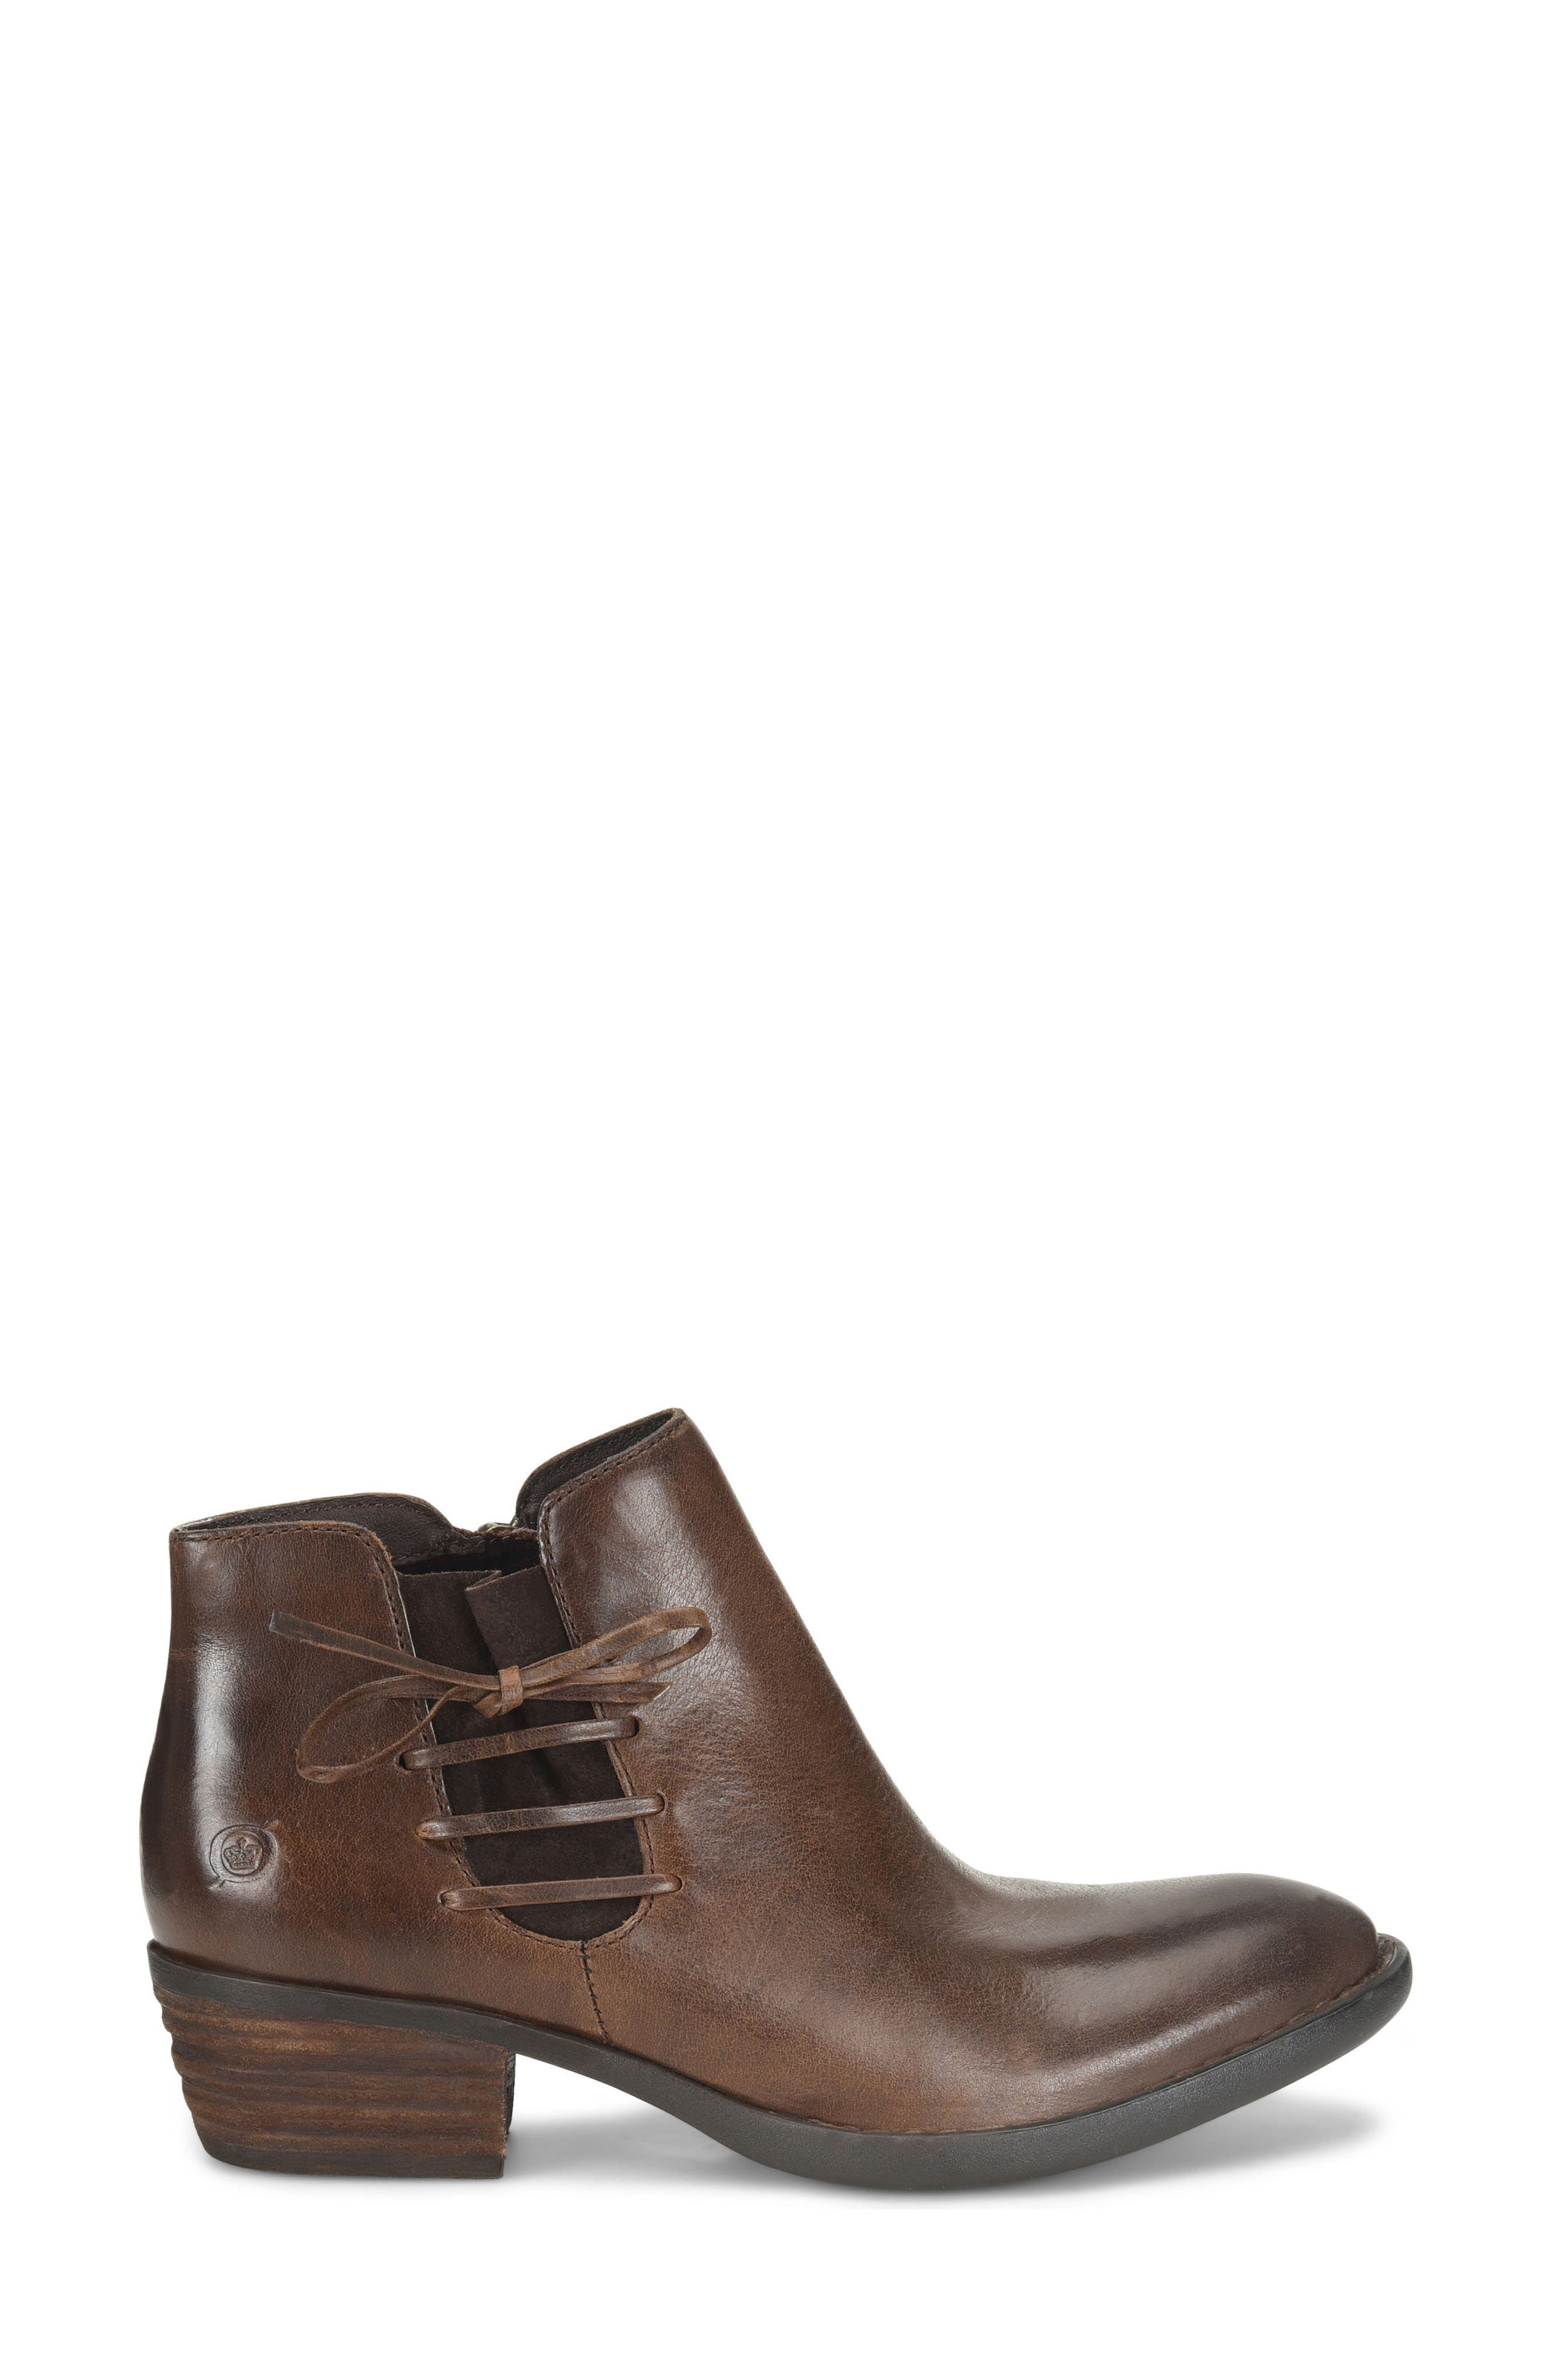 Bowlen Bootie,                             Alternate thumbnail 3, color,                             Brown Leather